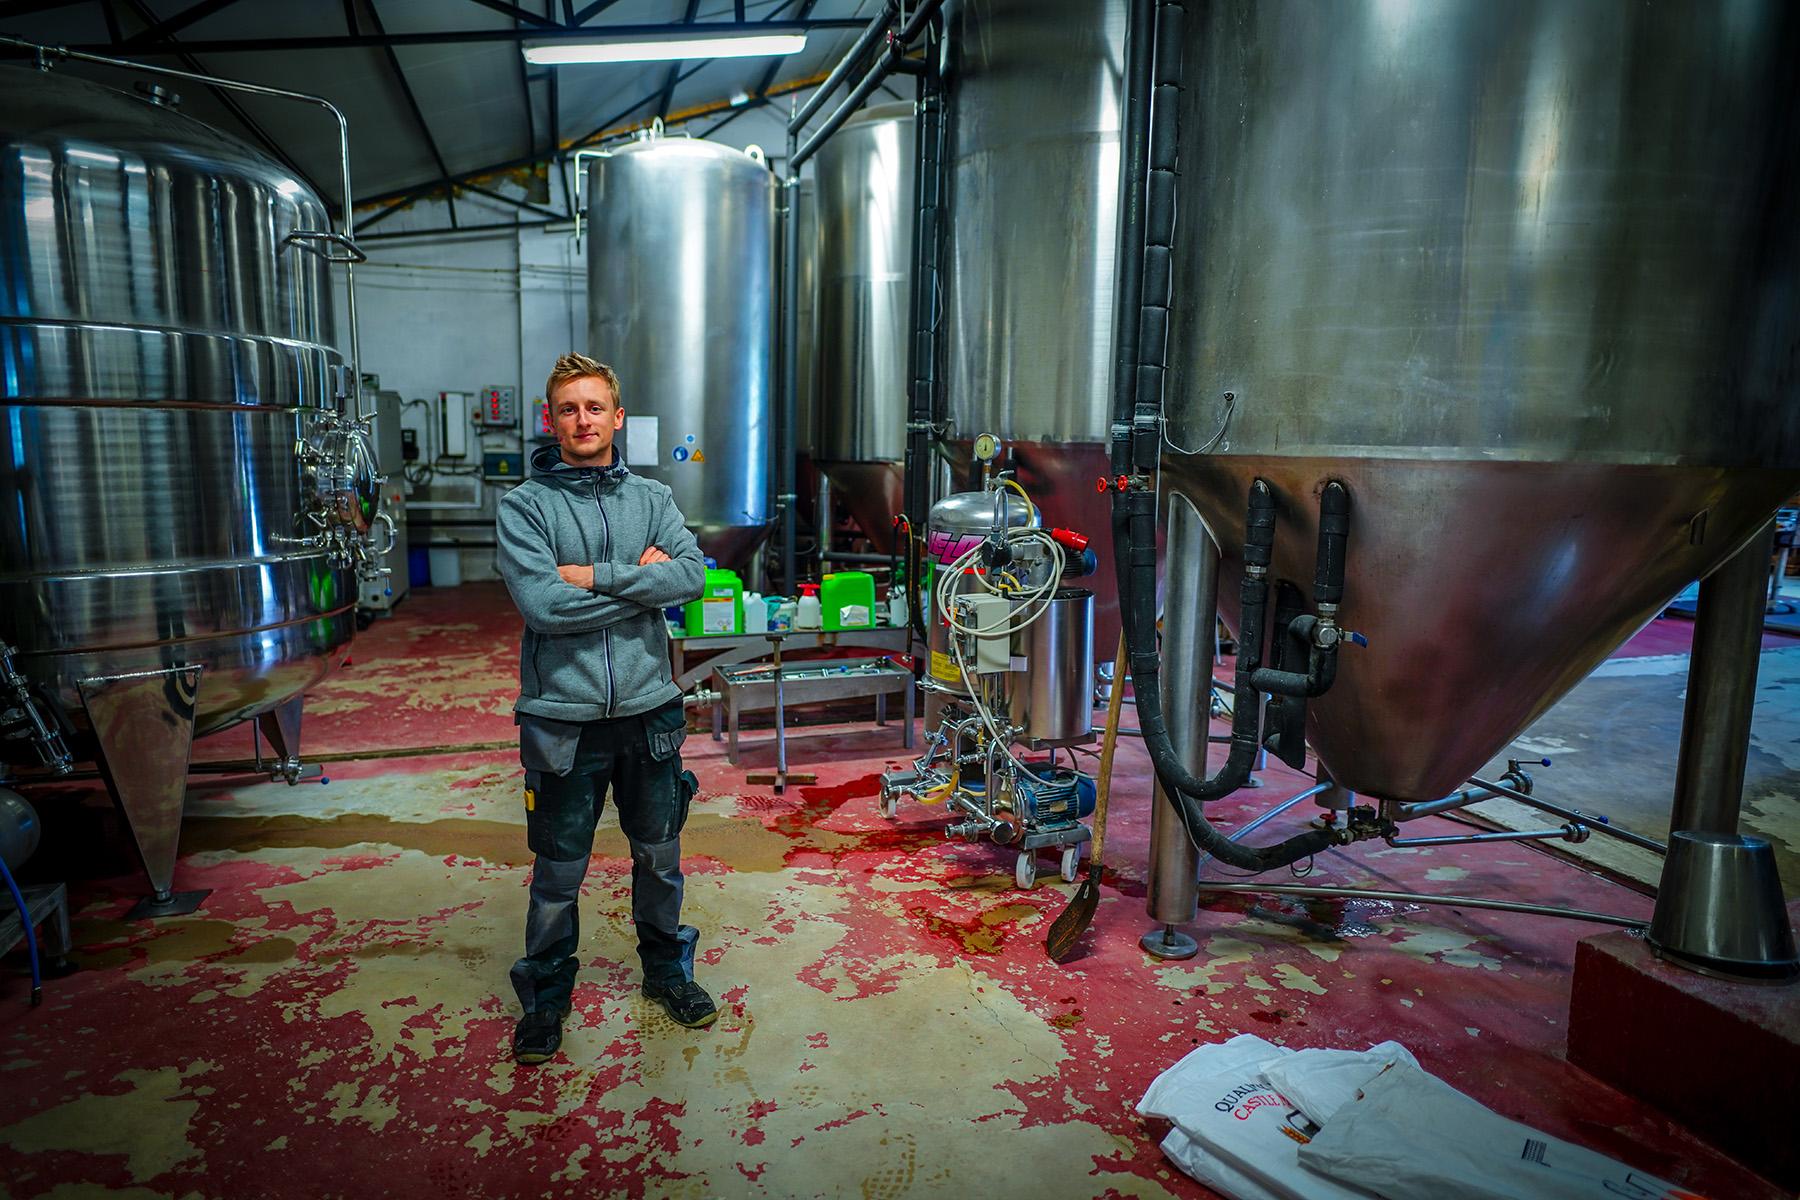 Léopold 7, a Belgian craft brewery